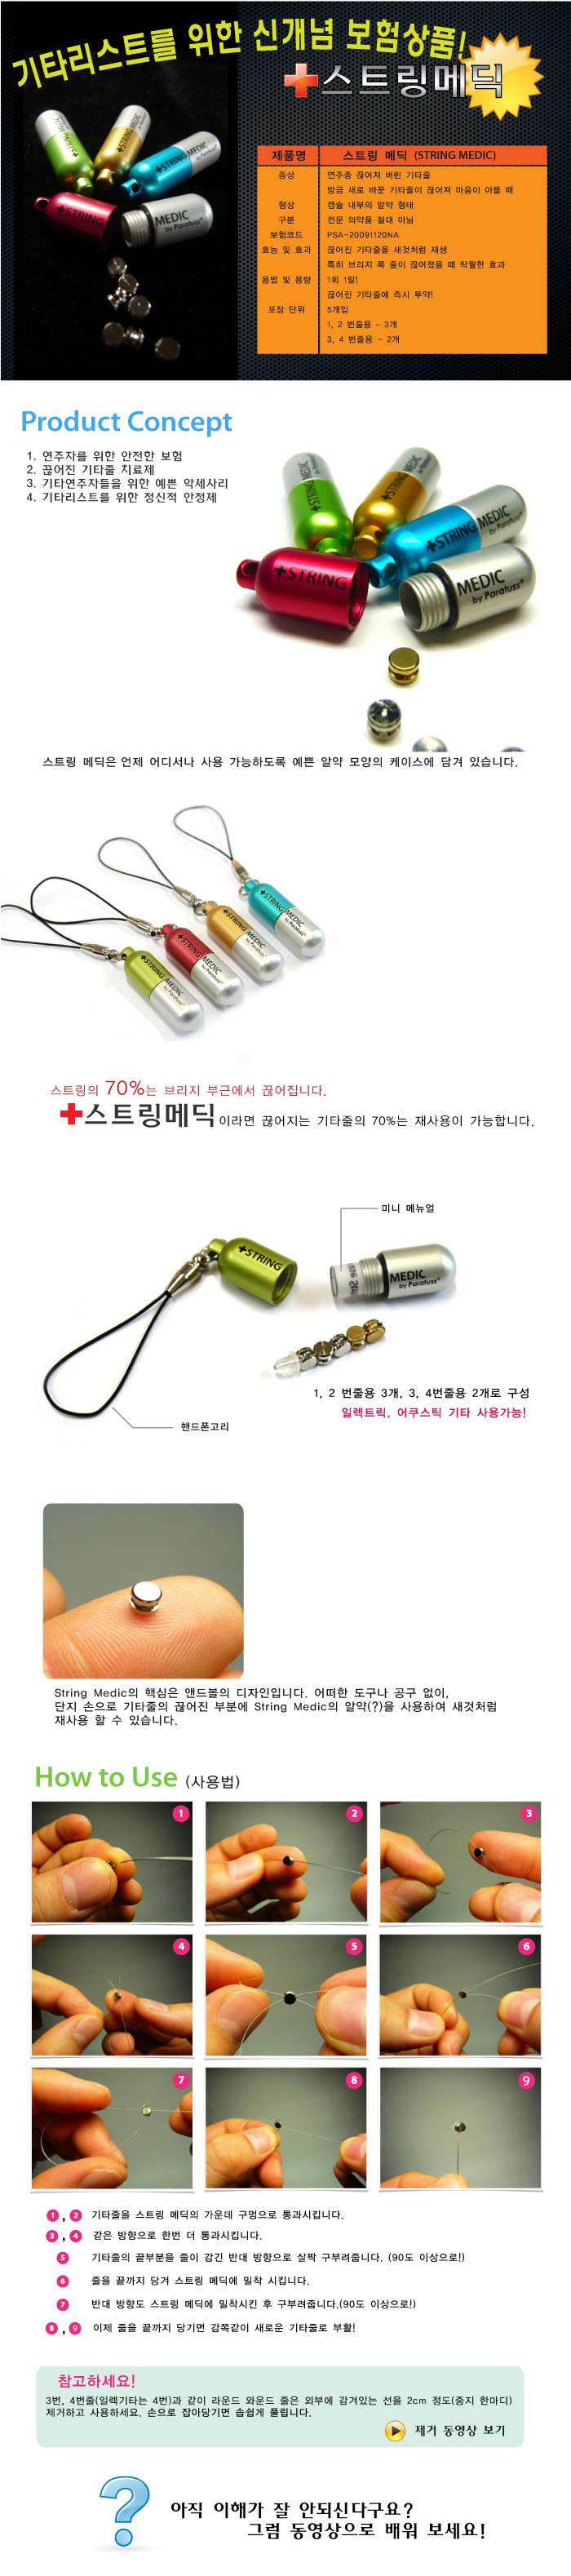 String_Medic_02